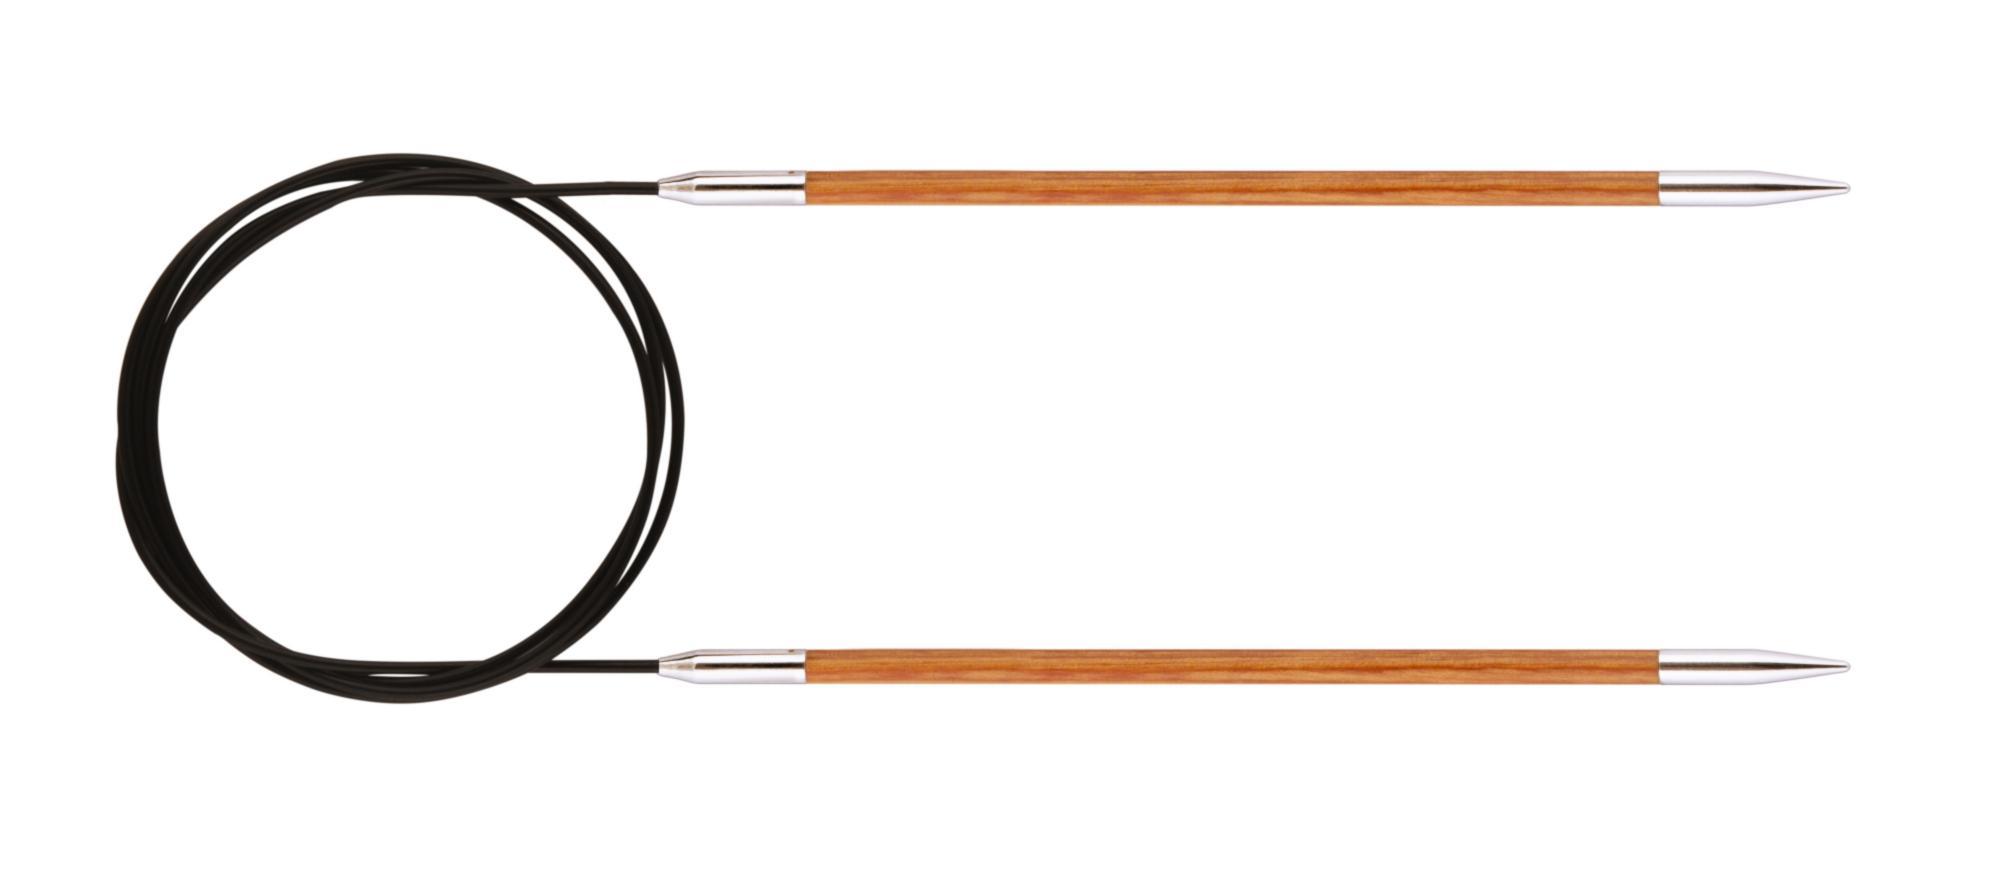 Спицы круговые 60 см Royale KnitPro, 29074, 3.75 мм